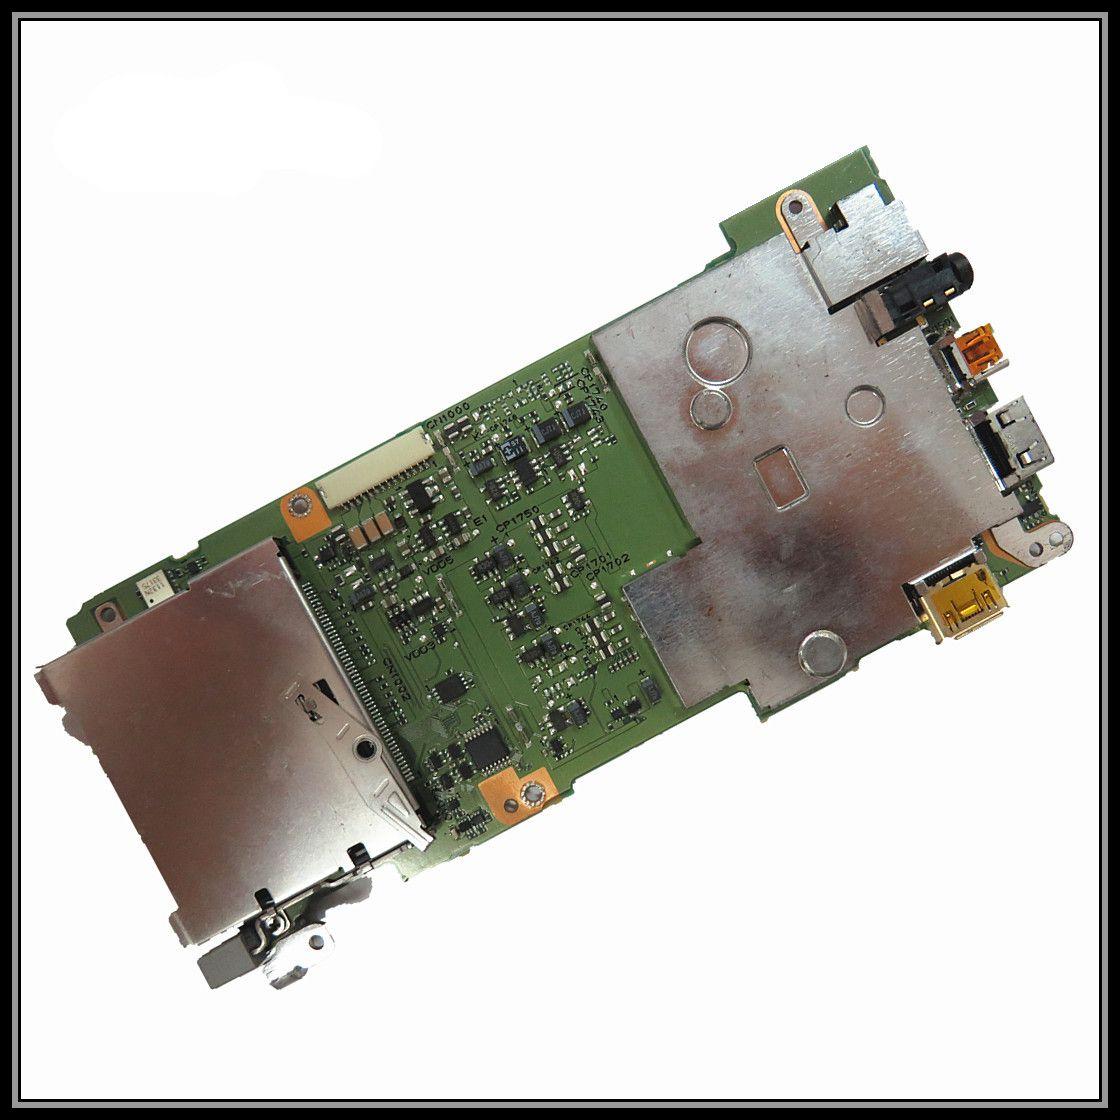 100% Original 5d Mark Ii /5d2 /5d Mark Main Board Mother Board Camera